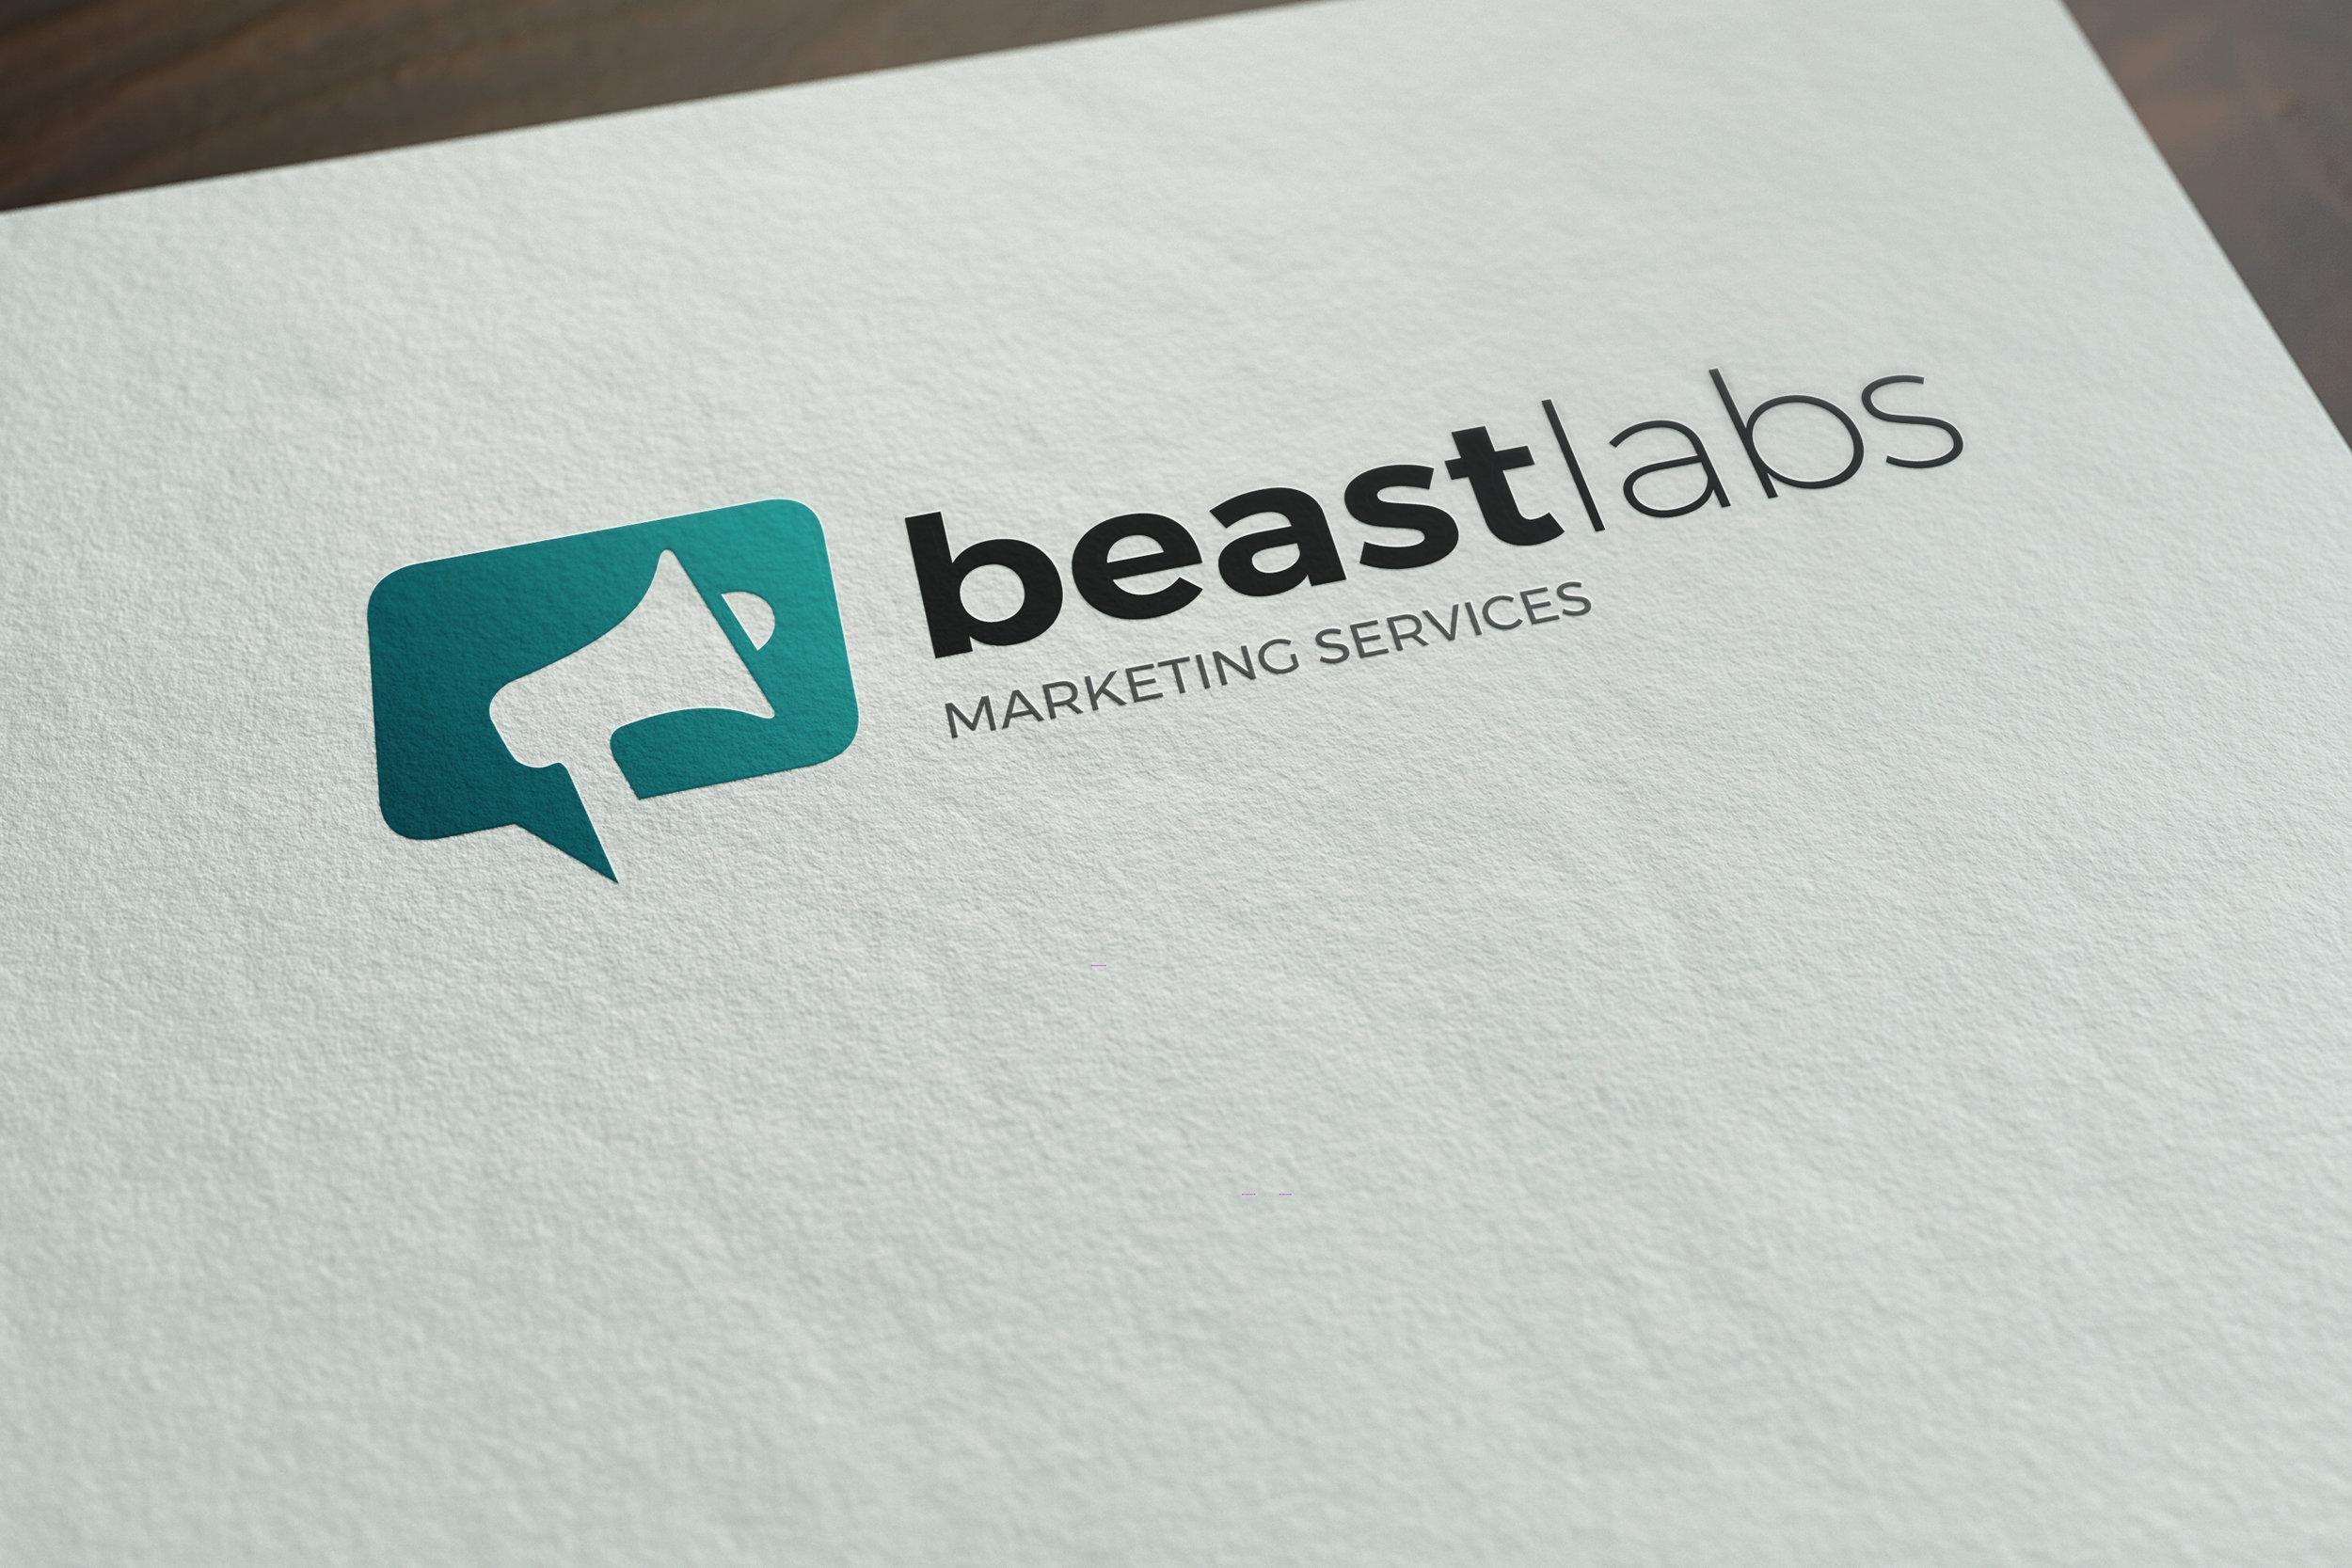 Beast Labs Logos -